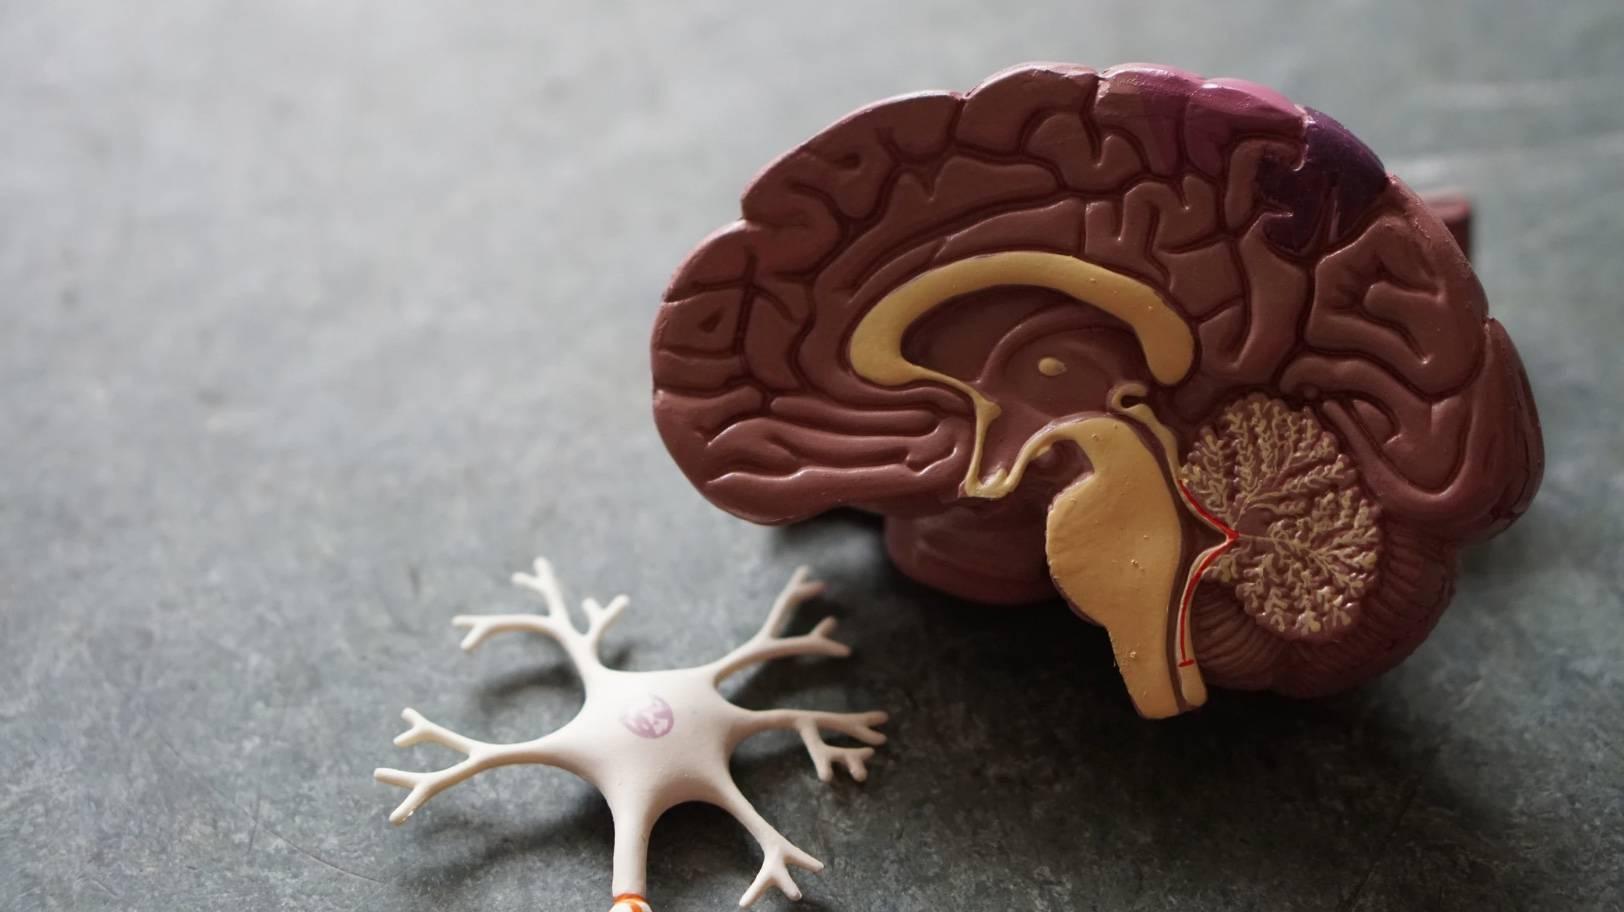 nerves, neurons, brain cells, cells, growth, neurogensis, nervous system, alzheimer's, parkinson's, huntington's, multiple sclerosis, denegeration, spasticity, cns, neural, neuron, growth, cbd, cbg, cbg oil, hemp